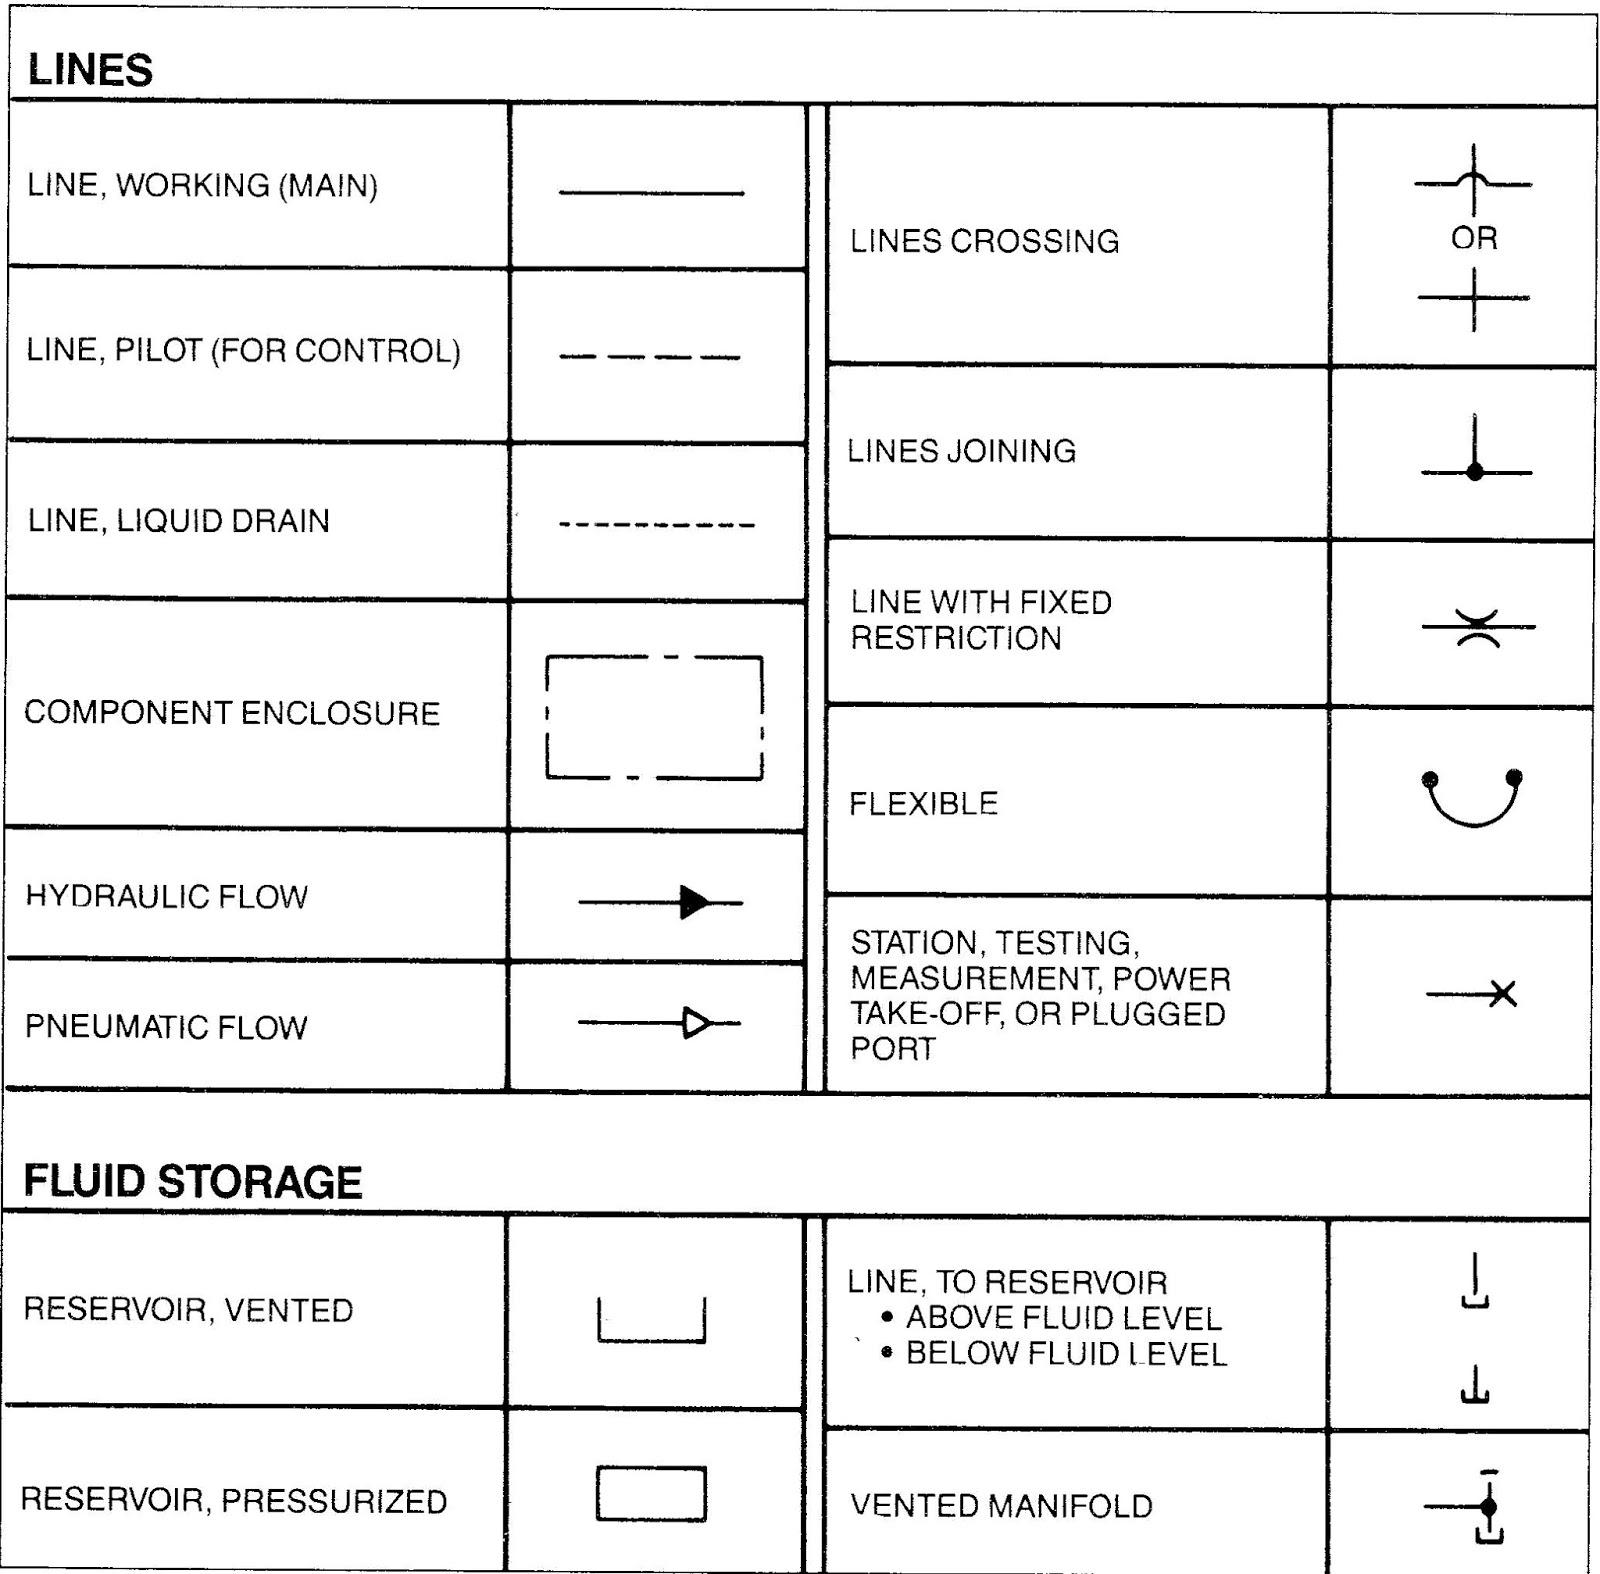 coriolis flow meter wiring diagram 2000 dodge durango parts hydraulic schematic symbols impremedia